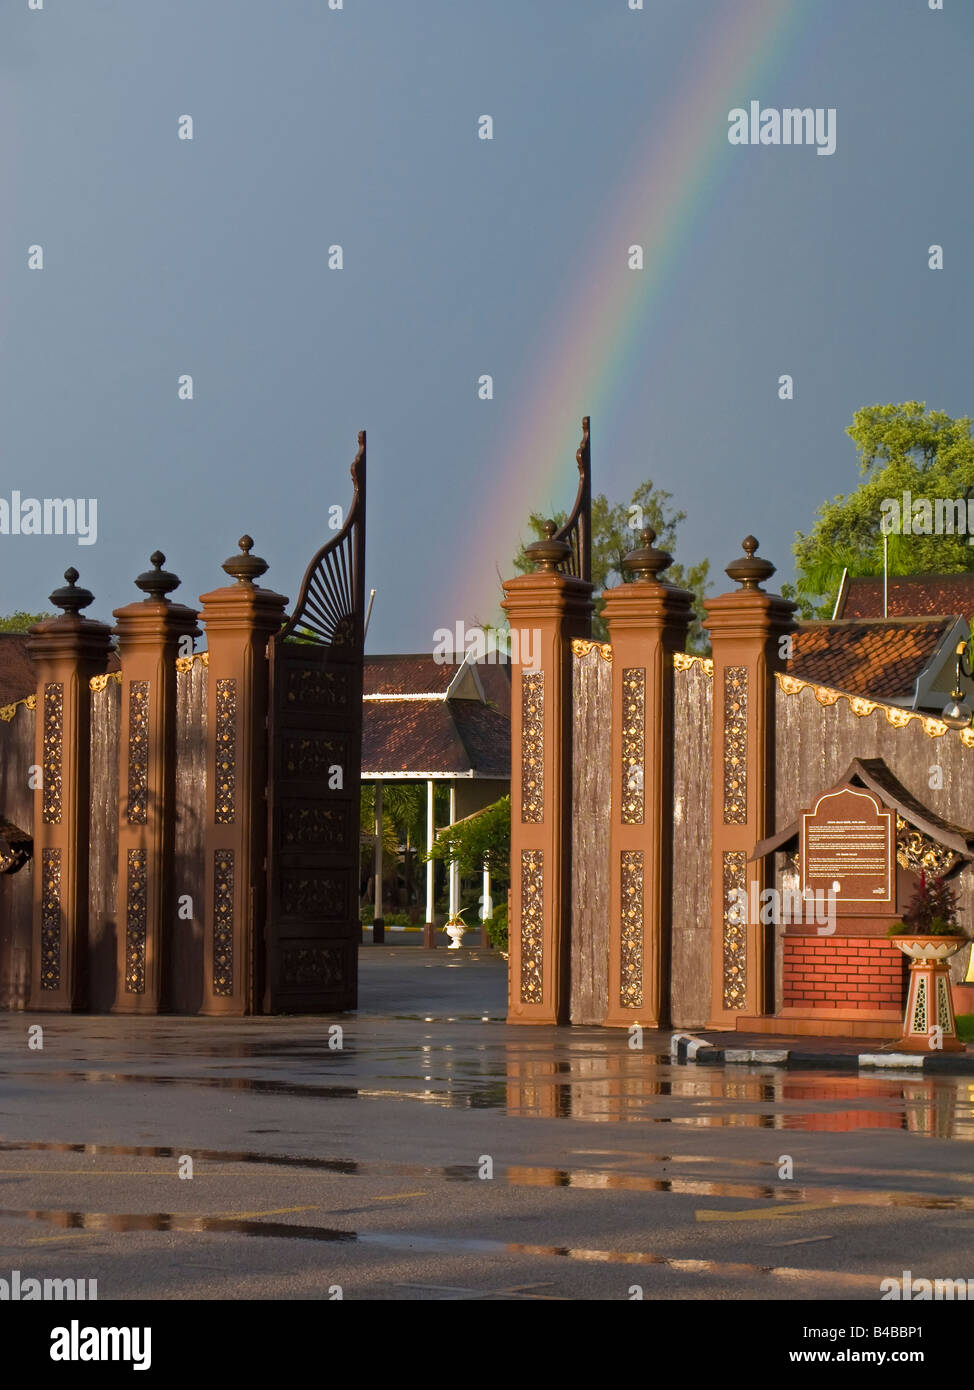 Asia, Malaysia, Kelantan State, Kota Bharu, entrance to the Royal Palace complex detail - Stock Image